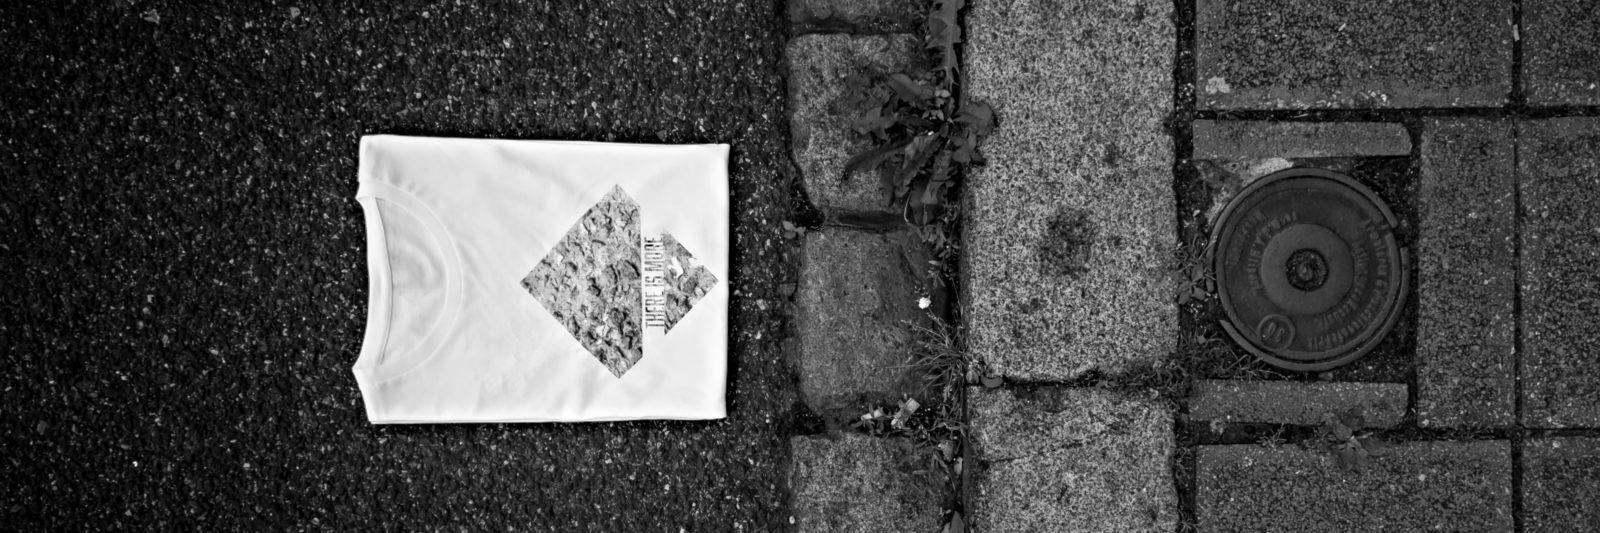 hecna – Streetwear aus Nürnberg | Christian Hetzner im Interview | GROSS∆RTIG